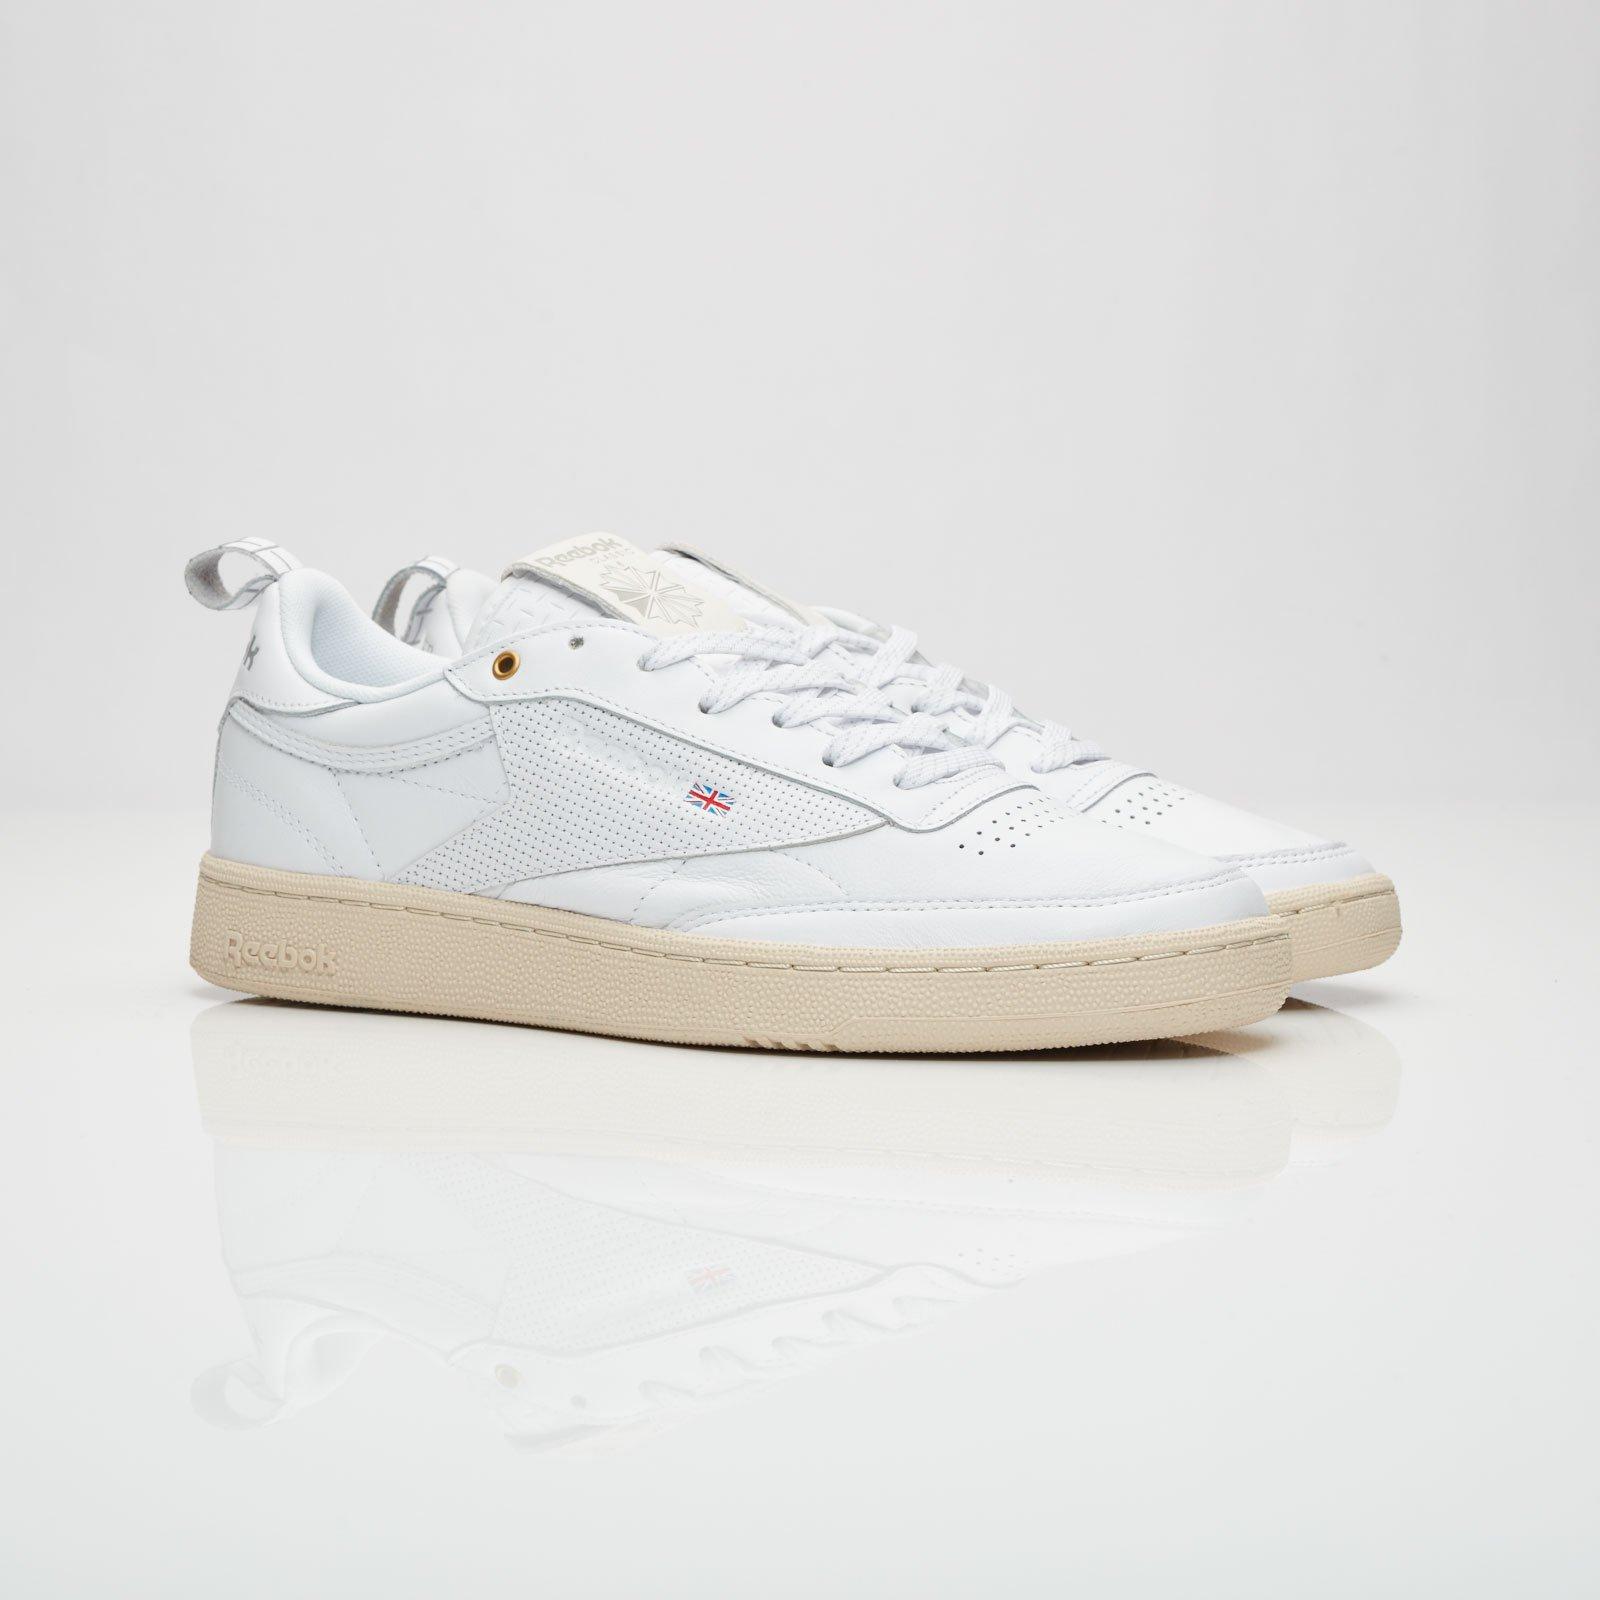 Reebok Club C CNL x Crossover Ar3754 Sneakersnstuff